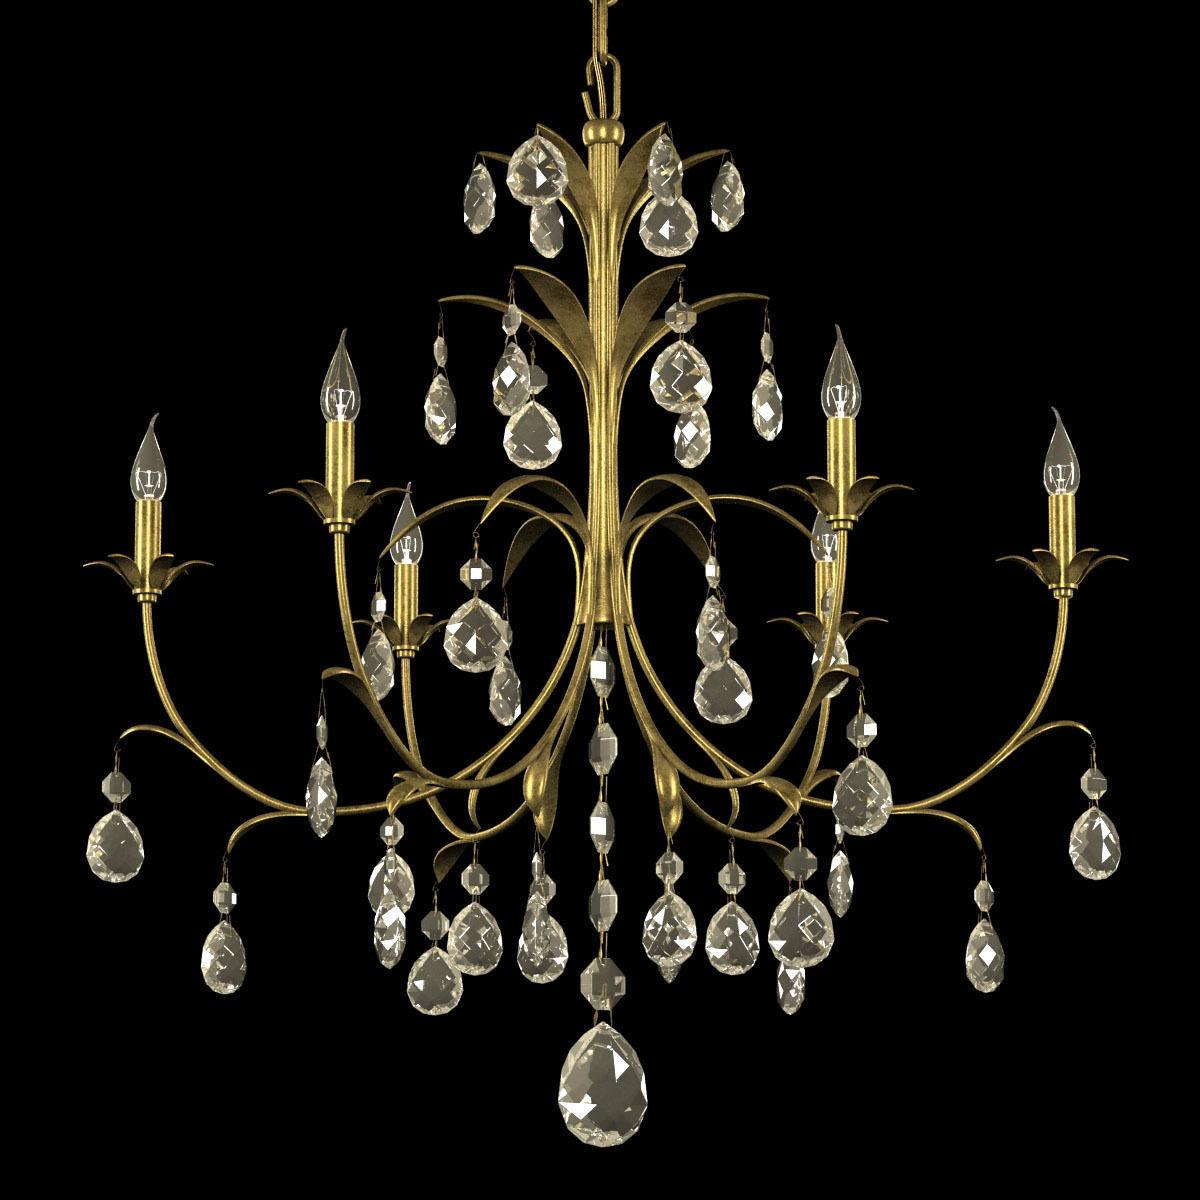 3d classic chandelier with metal leaves cgtrader classic chandelier with metal leaves 3d model max obj 3ds fbx mtl 3 arubaitofo Images